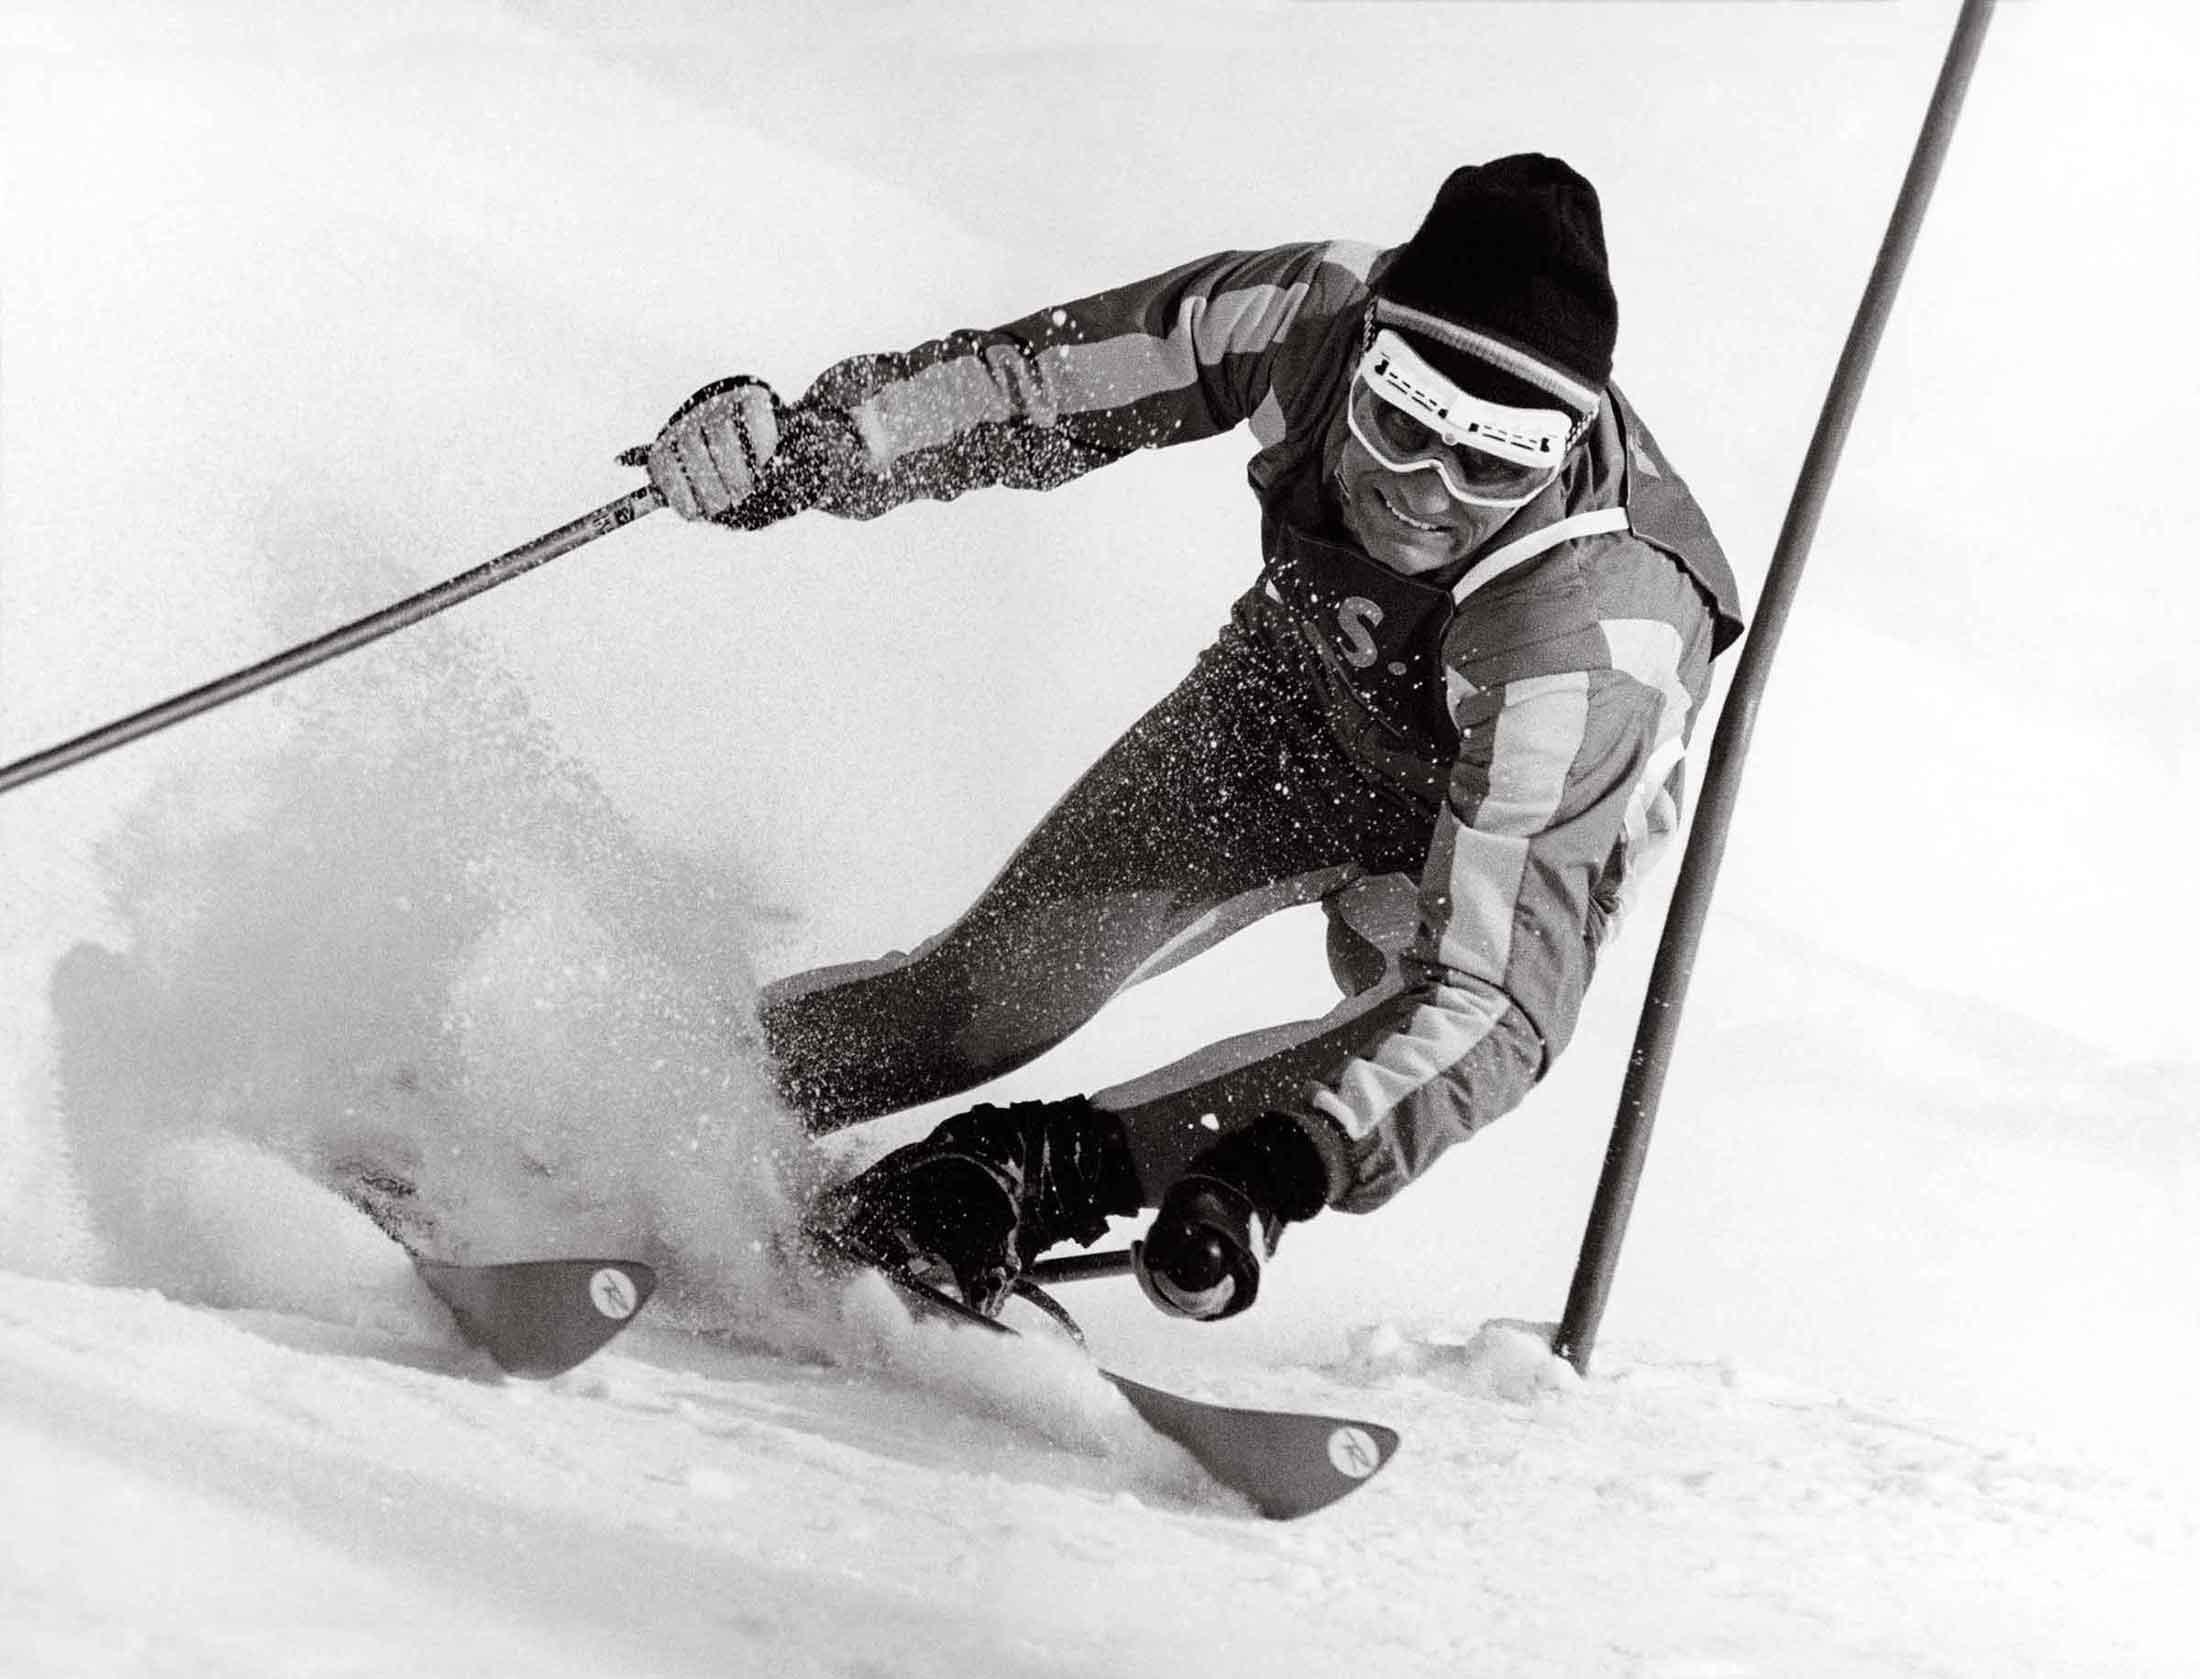 photographie killy ski noir et blanc